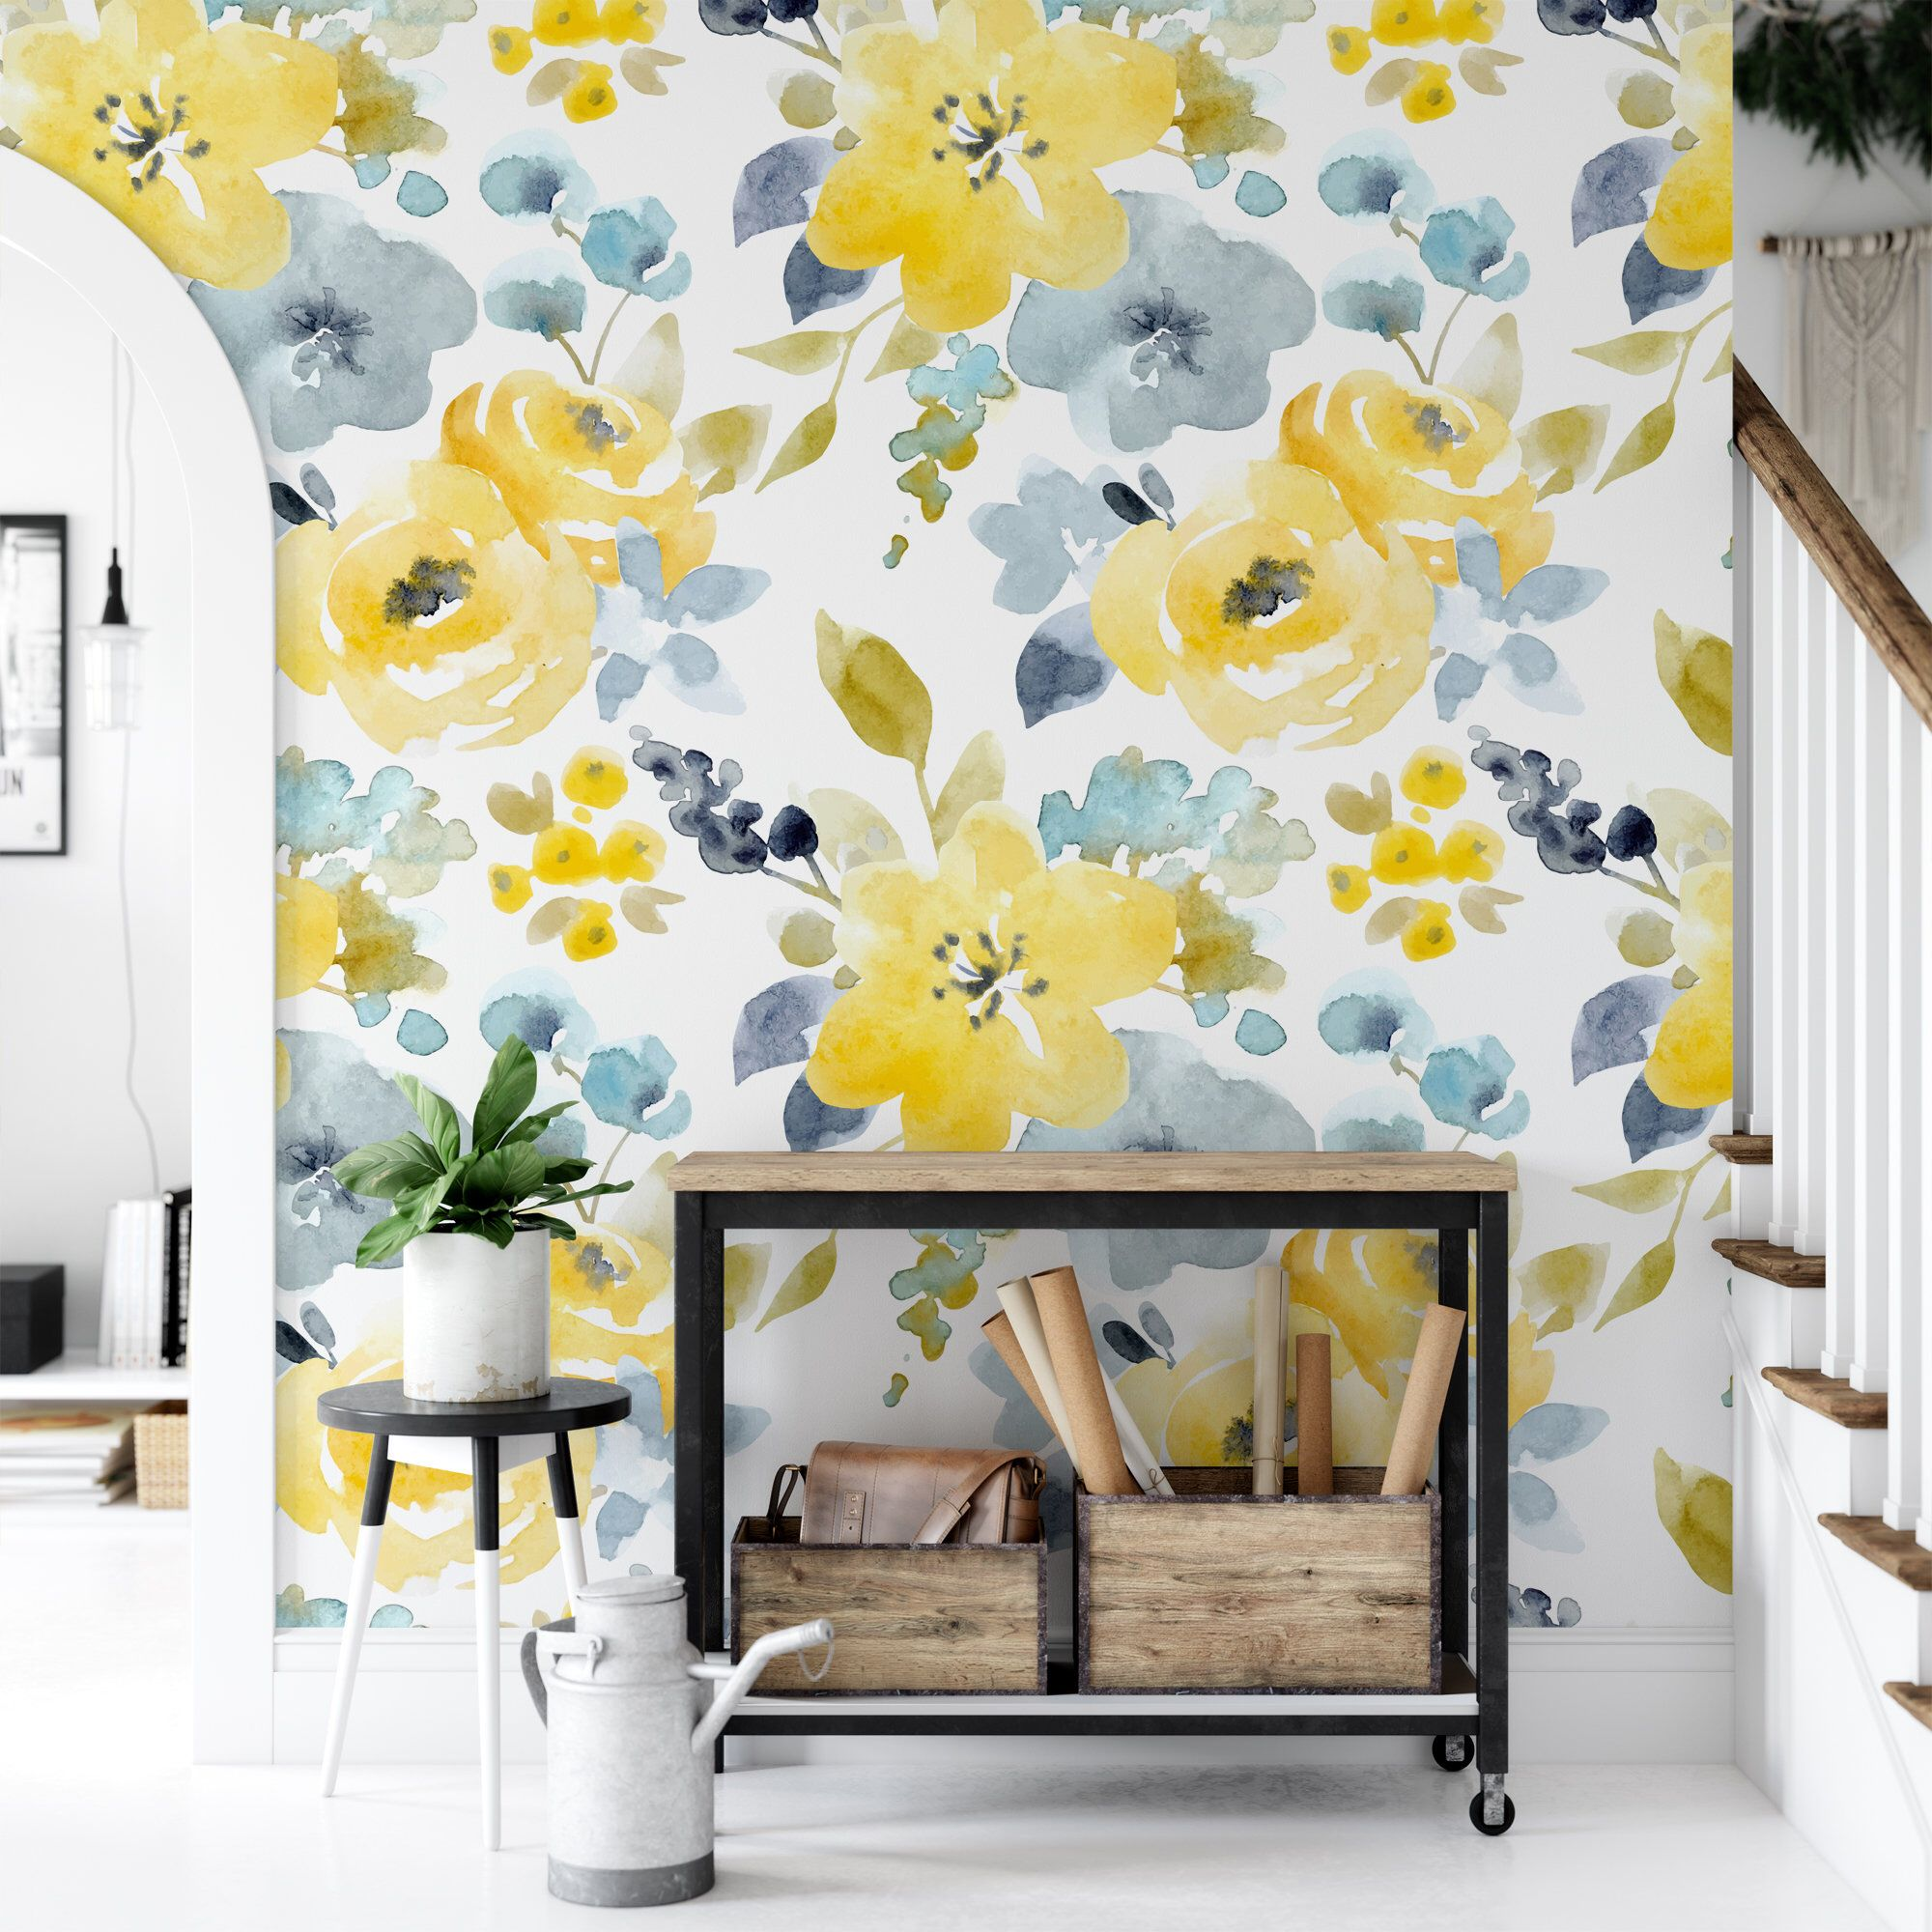 Watercolor Yellow Floral Removable Wallpaper Peel And Stick Etsy Removable Wallpaper Yellow Accent Walls Nursery Room Decor